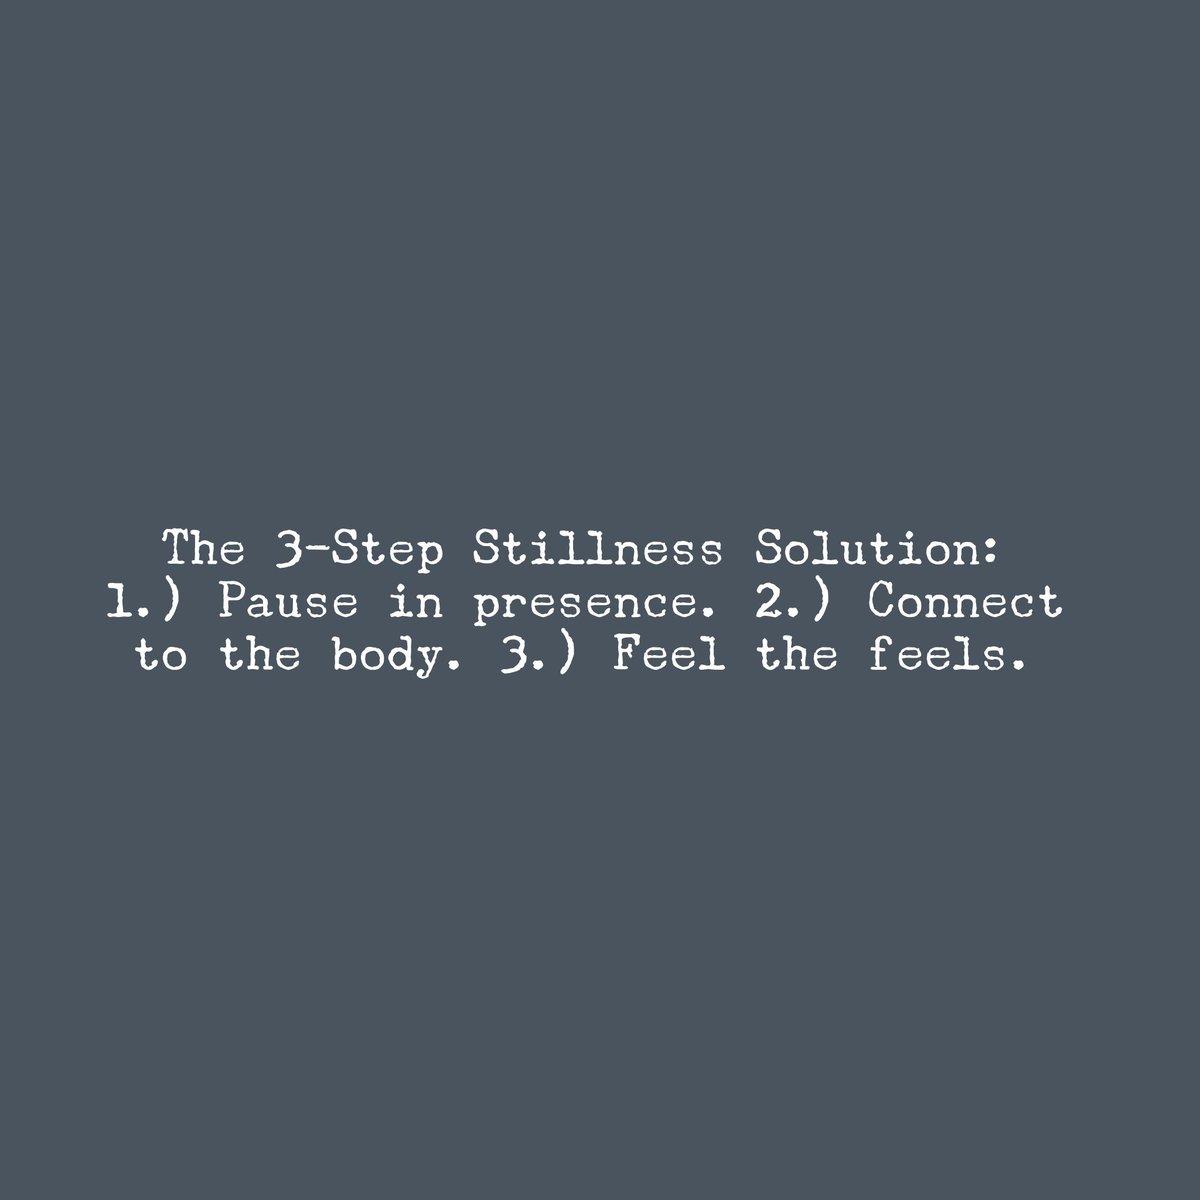 #StillnessSchool #NotPerfectJustPresent #mindfulness #meditation #energy #TheStillnessSolution #pause #connect #feeltheFeels https://t.co/H9XSq4fazw